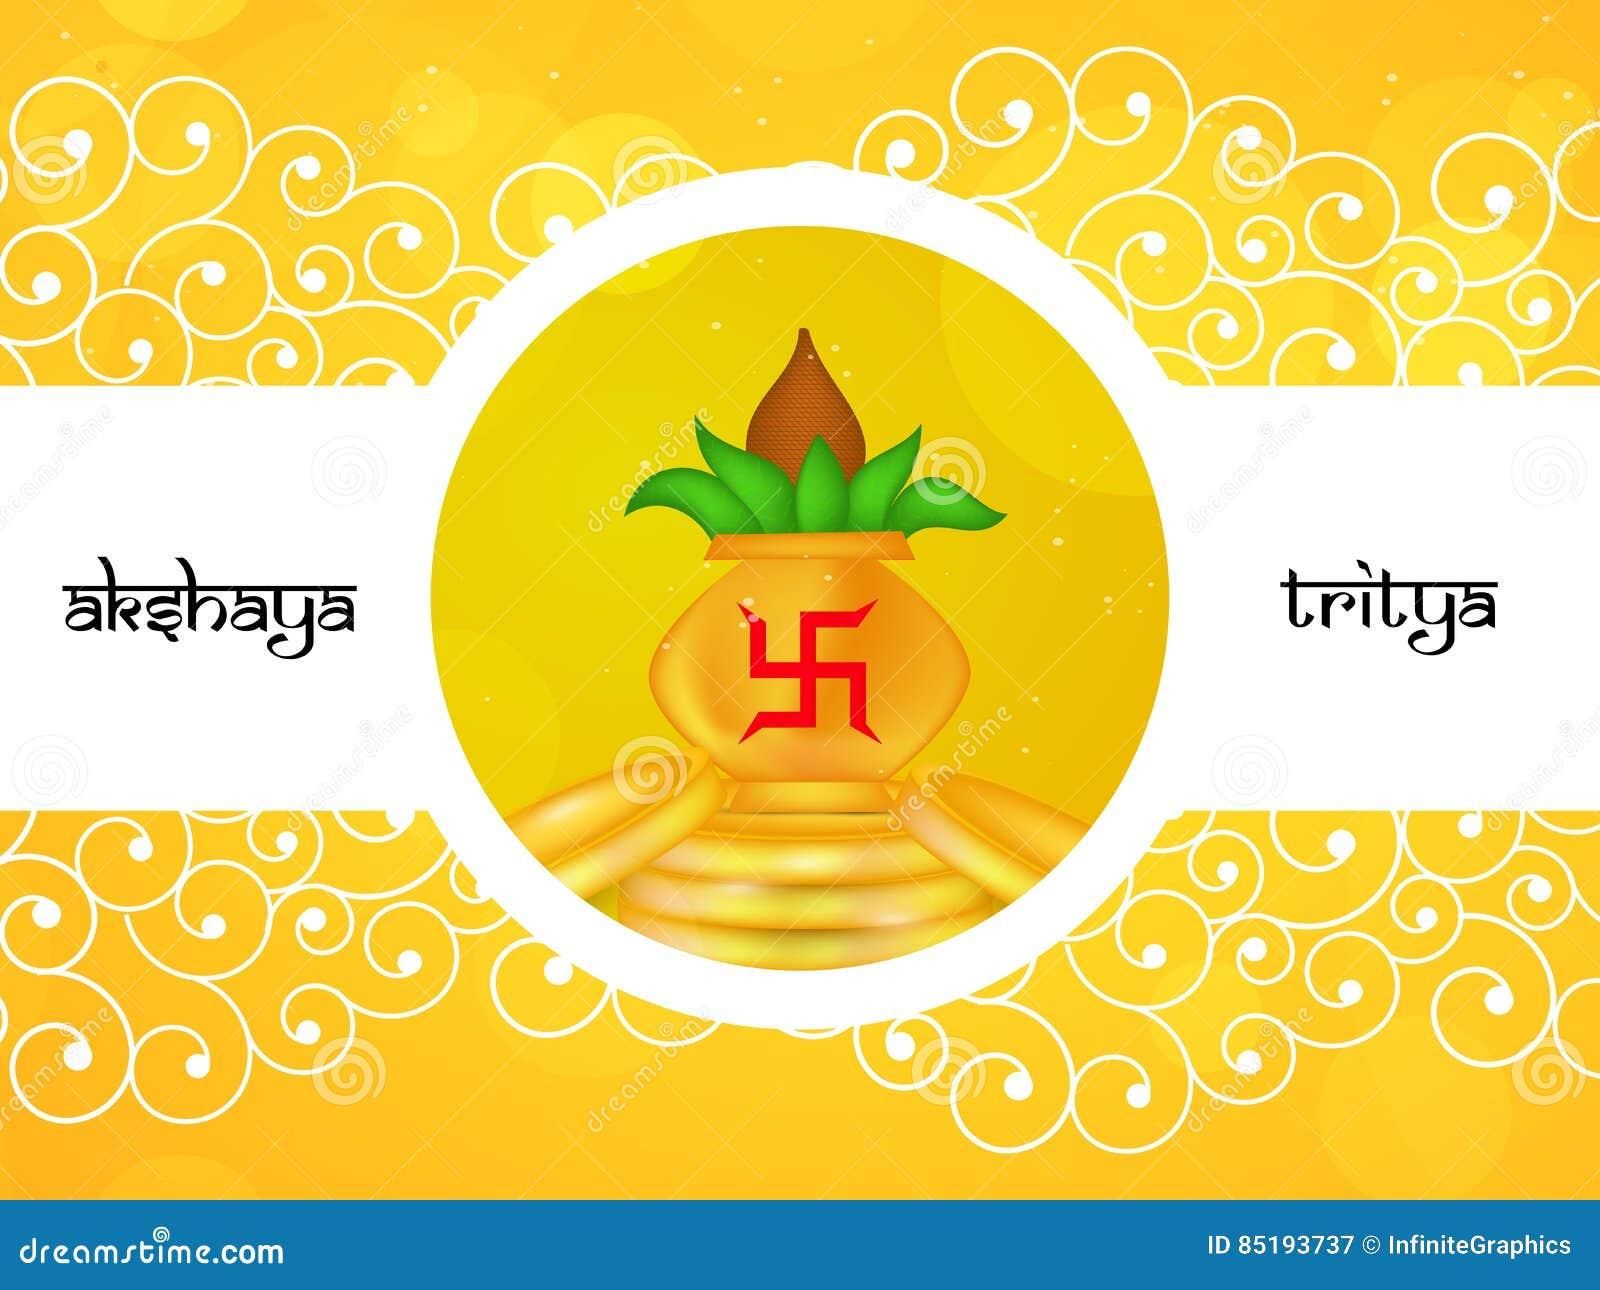 Fond Dakshaya Tritiya Illustration De Vecteur Illustration Du